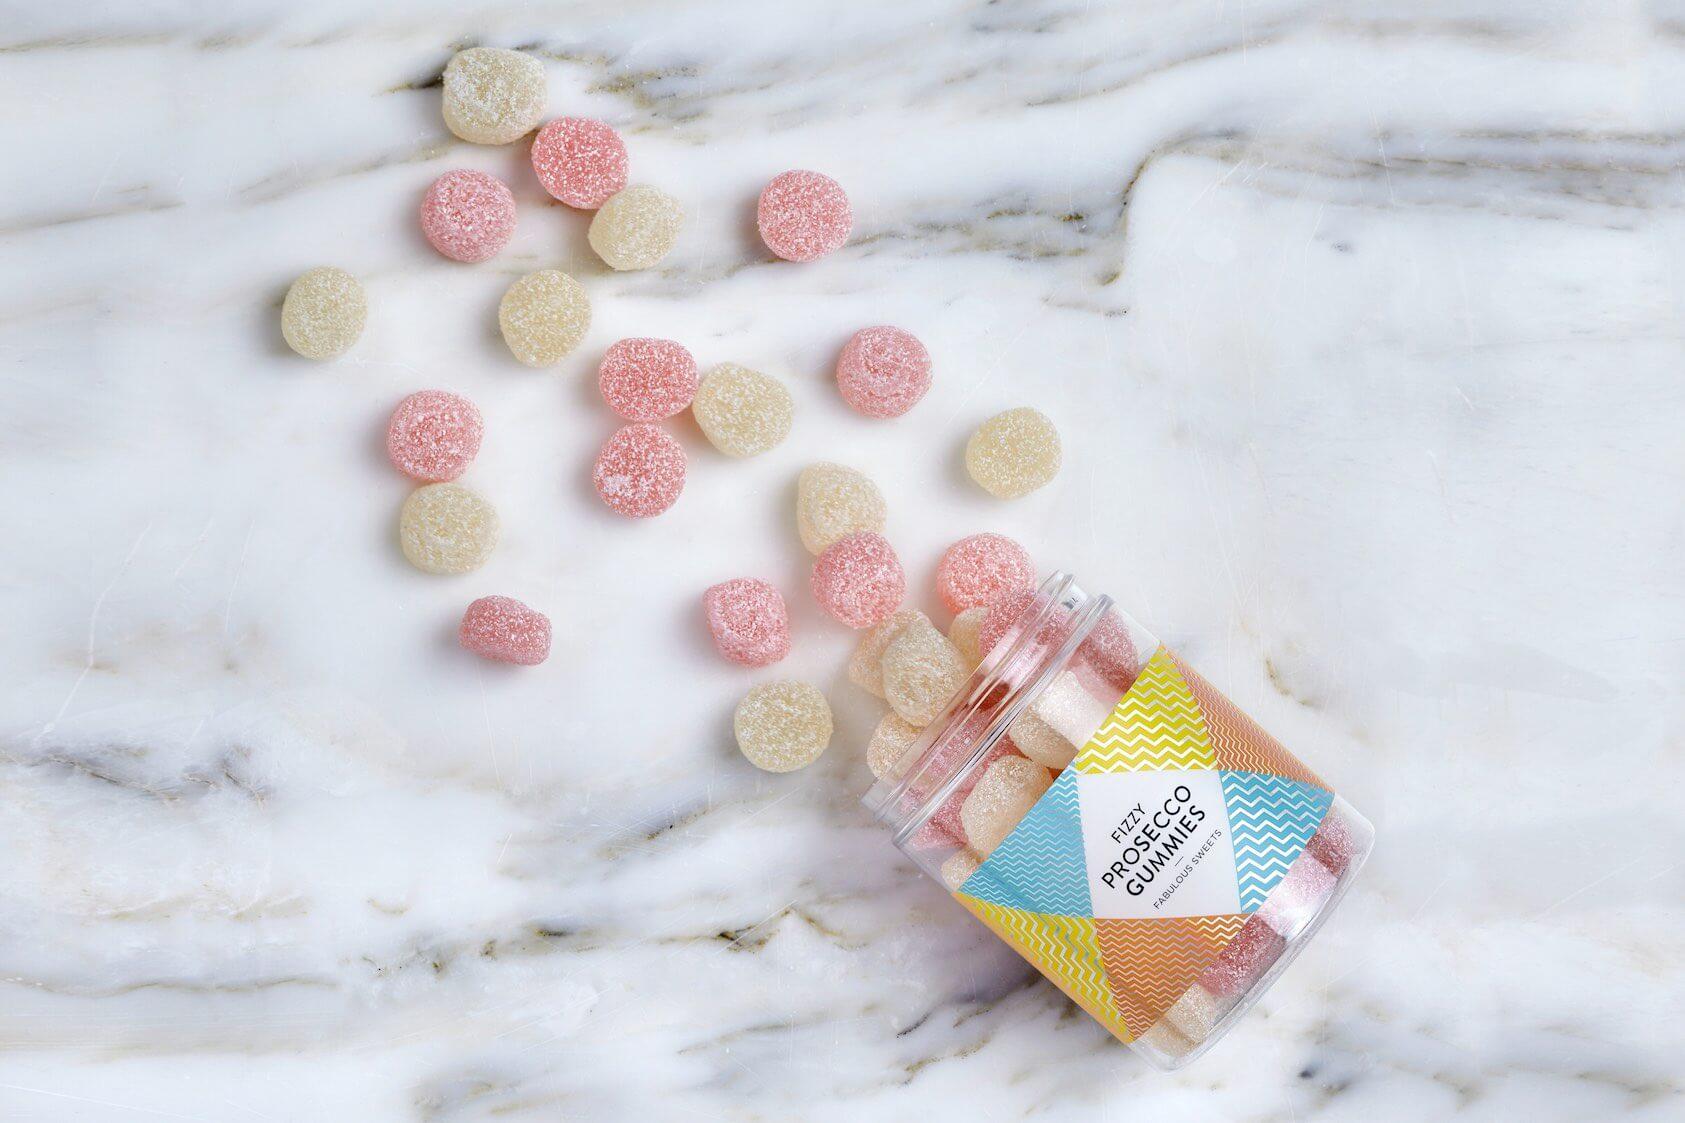 sugarsin-fizzy-prosecco-gummies-jar